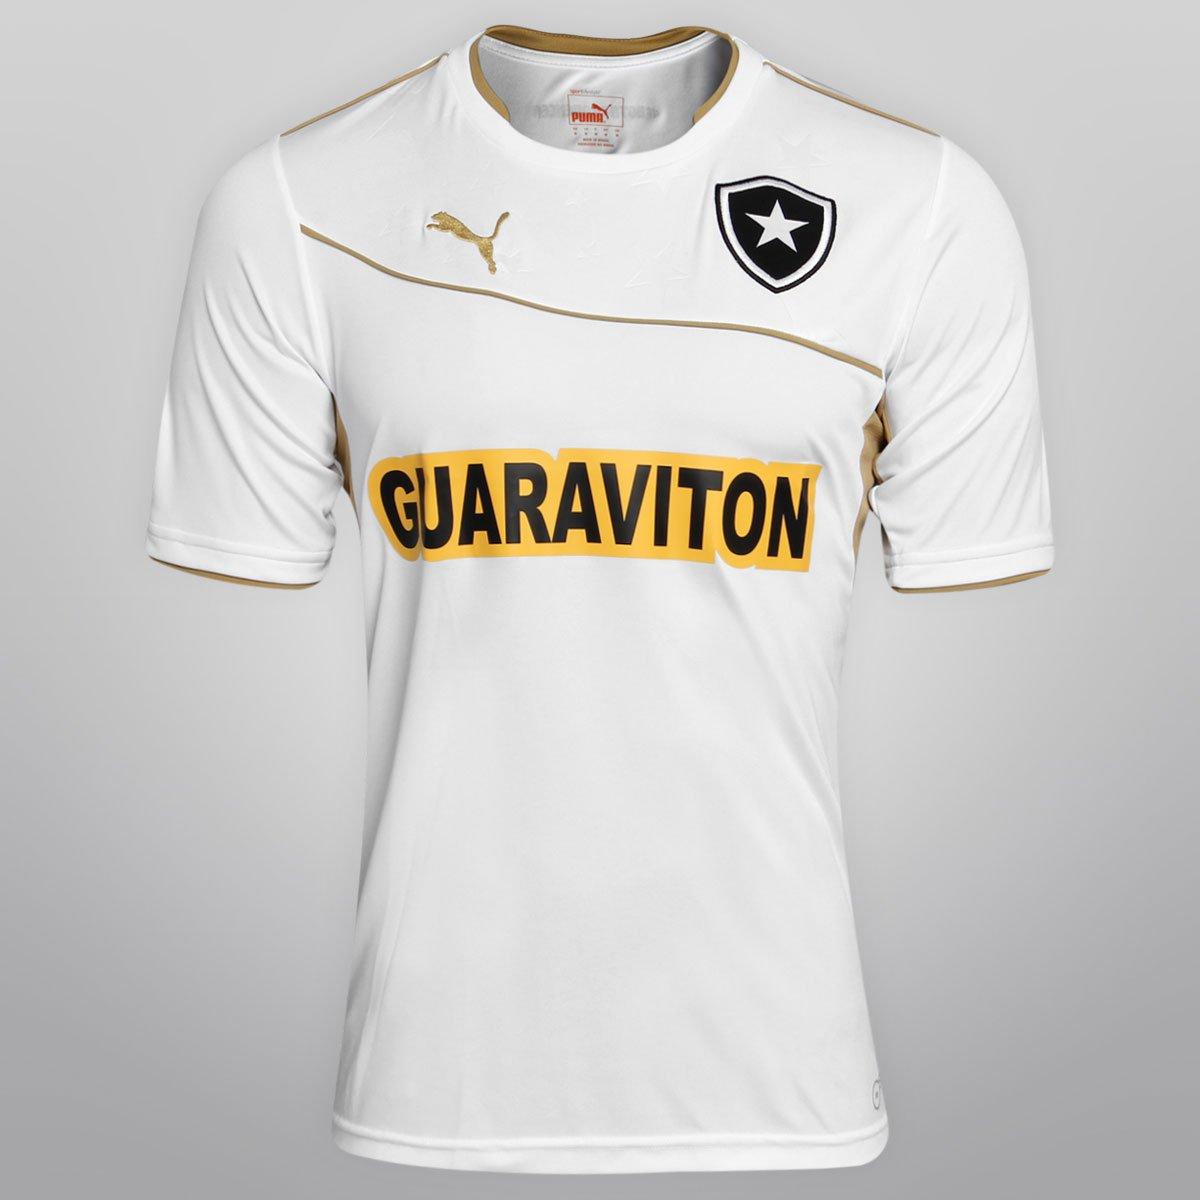 Camisa Puma Botafogo III 13 14 s nº - Compre Agora  e57aaa4bebc31